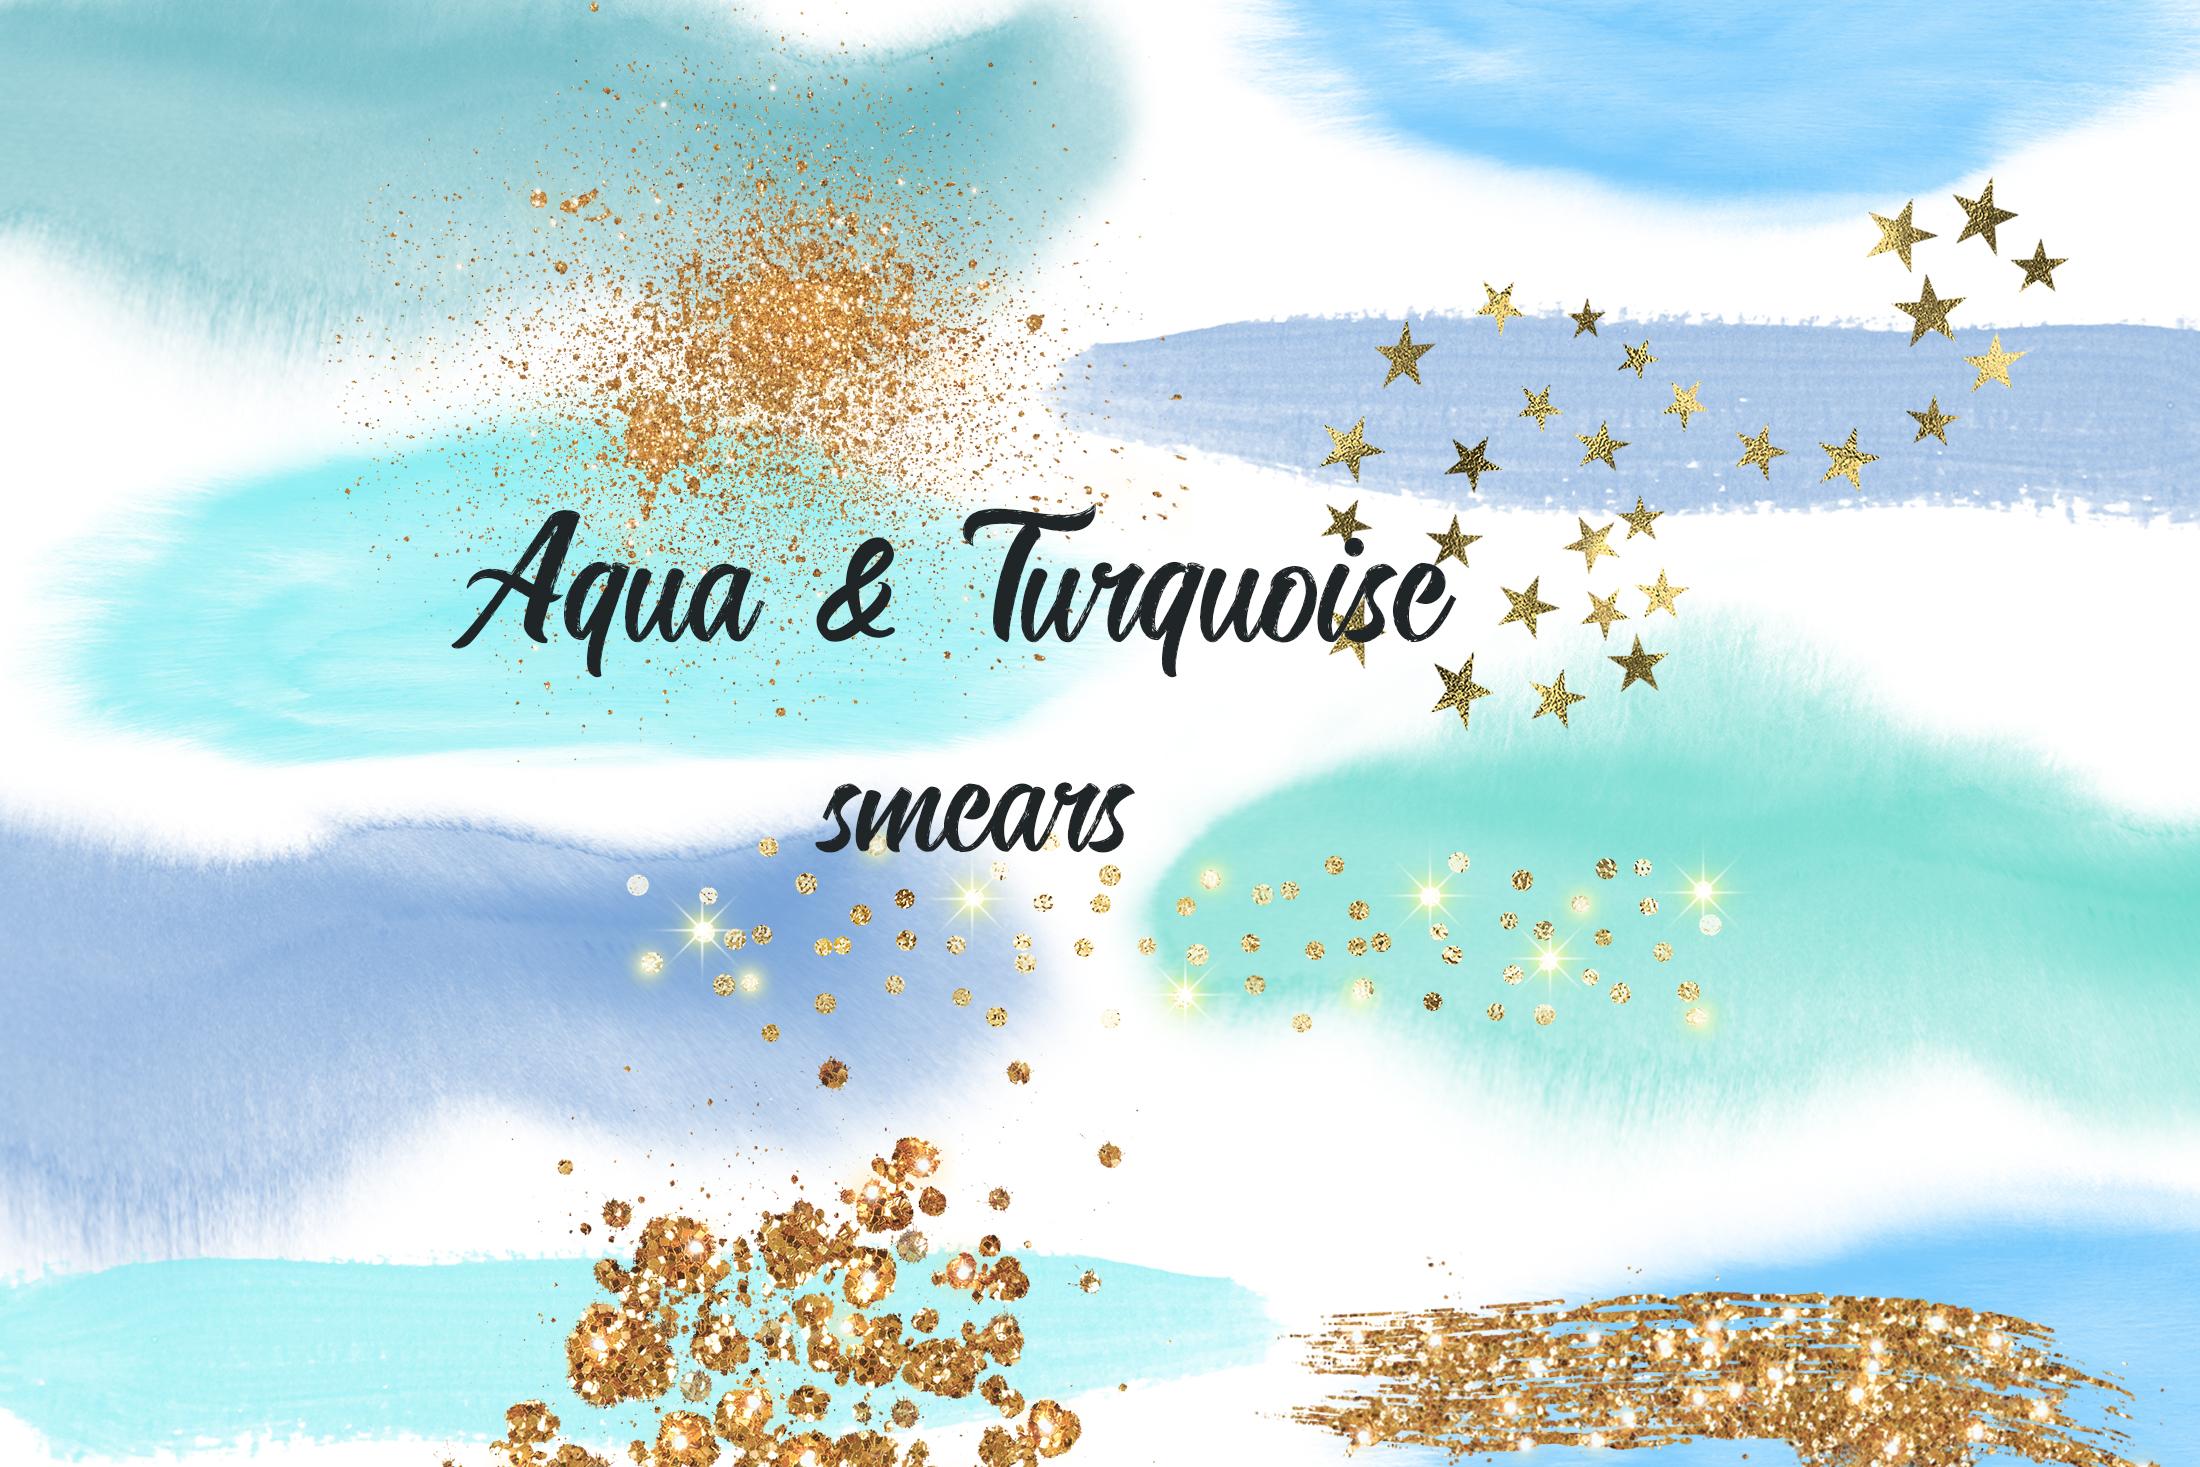 Aqua&Turquoise smears example image 1